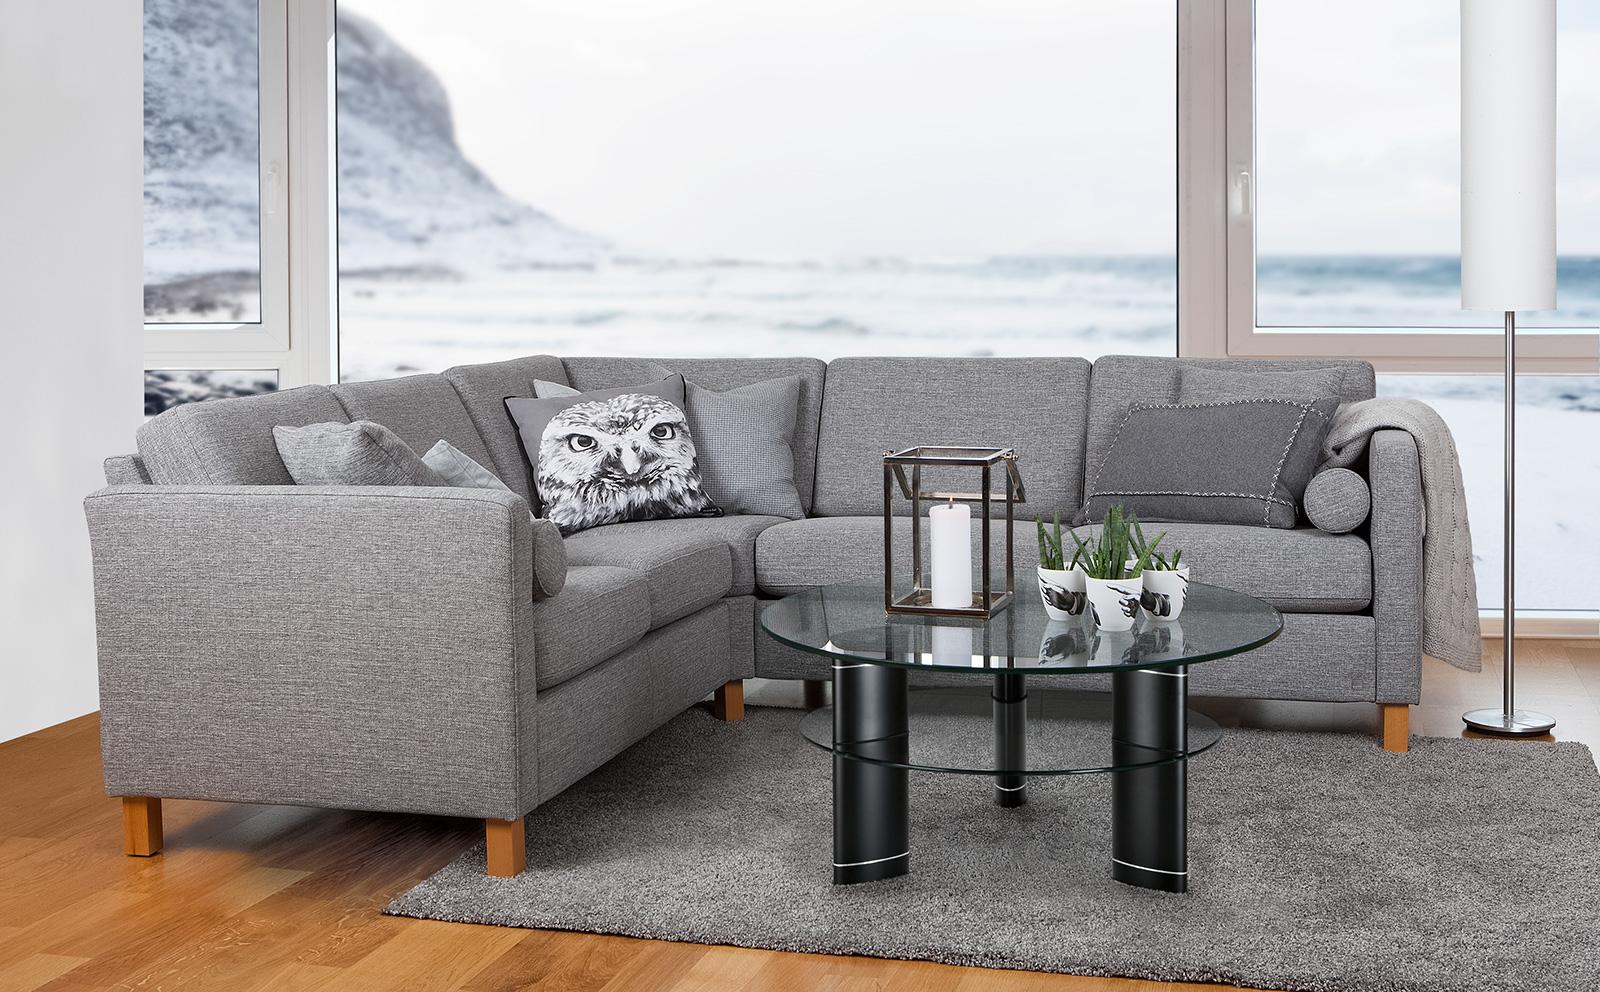 Sandefjord_sofa-nytt-bordB.jpg